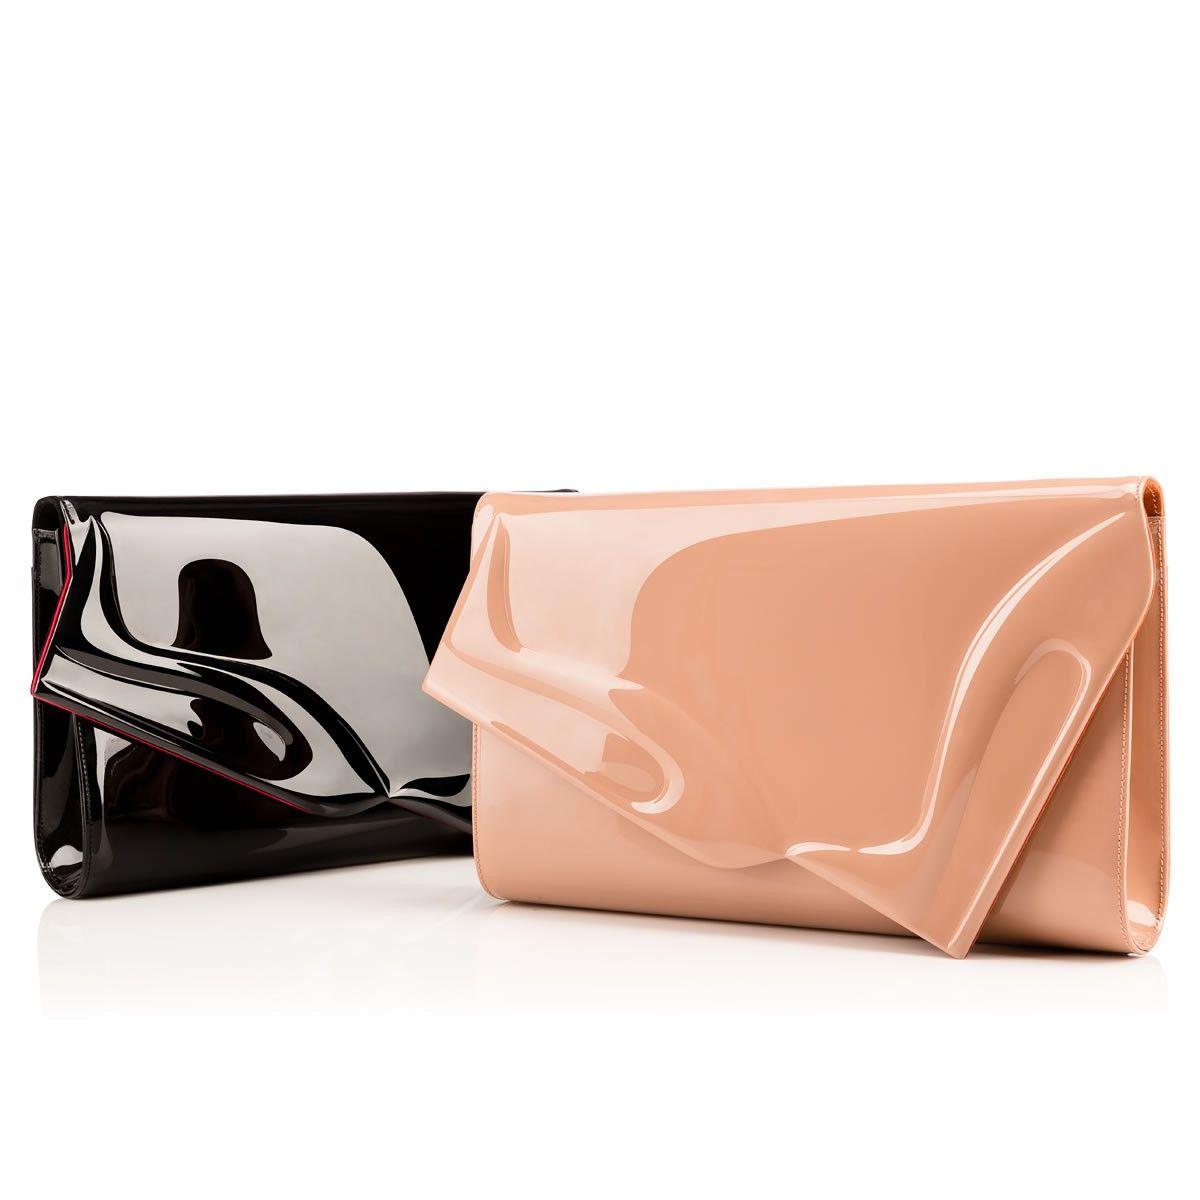 abd0669c9c1 So Kate Baguette Clutch Nude Patent Leather - Handbags - Christian ...